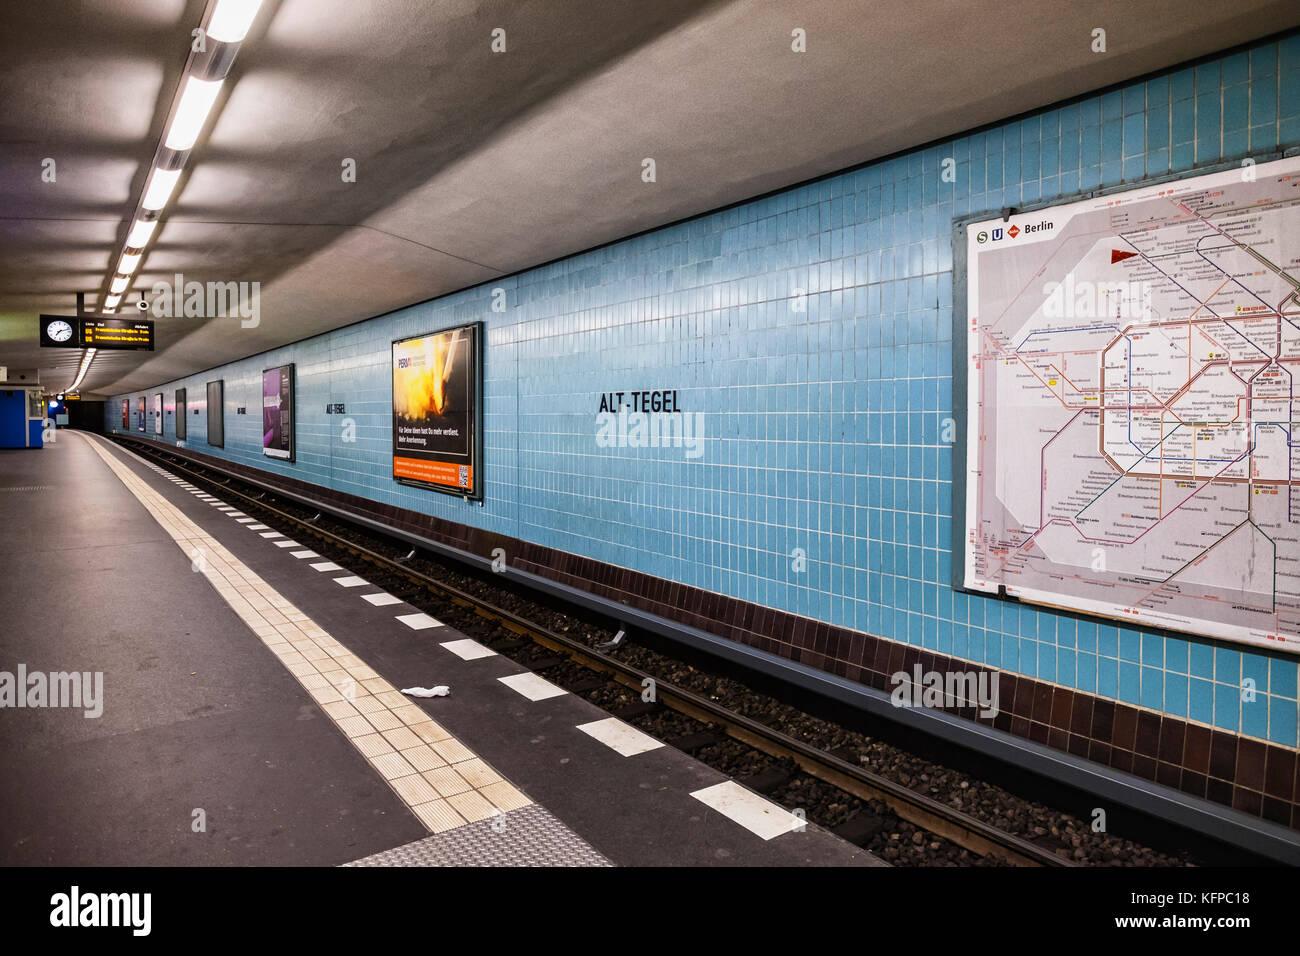 Berlin alt tegel metropolitana u bahn piattaforma con piastrelle